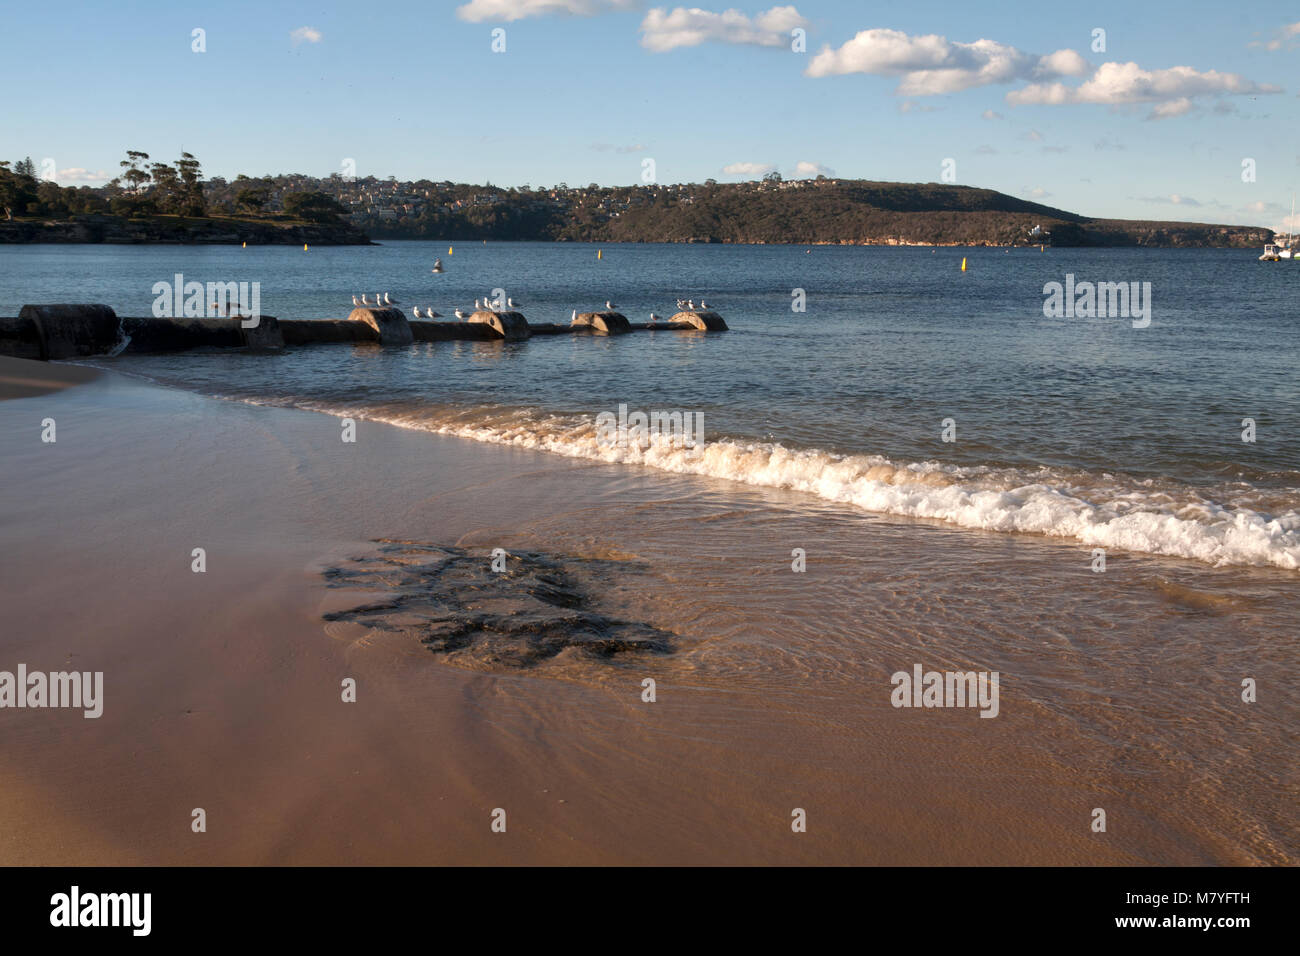 balmoral beach hunter bay headland park mosman sydney new south wales australia - Stock Image